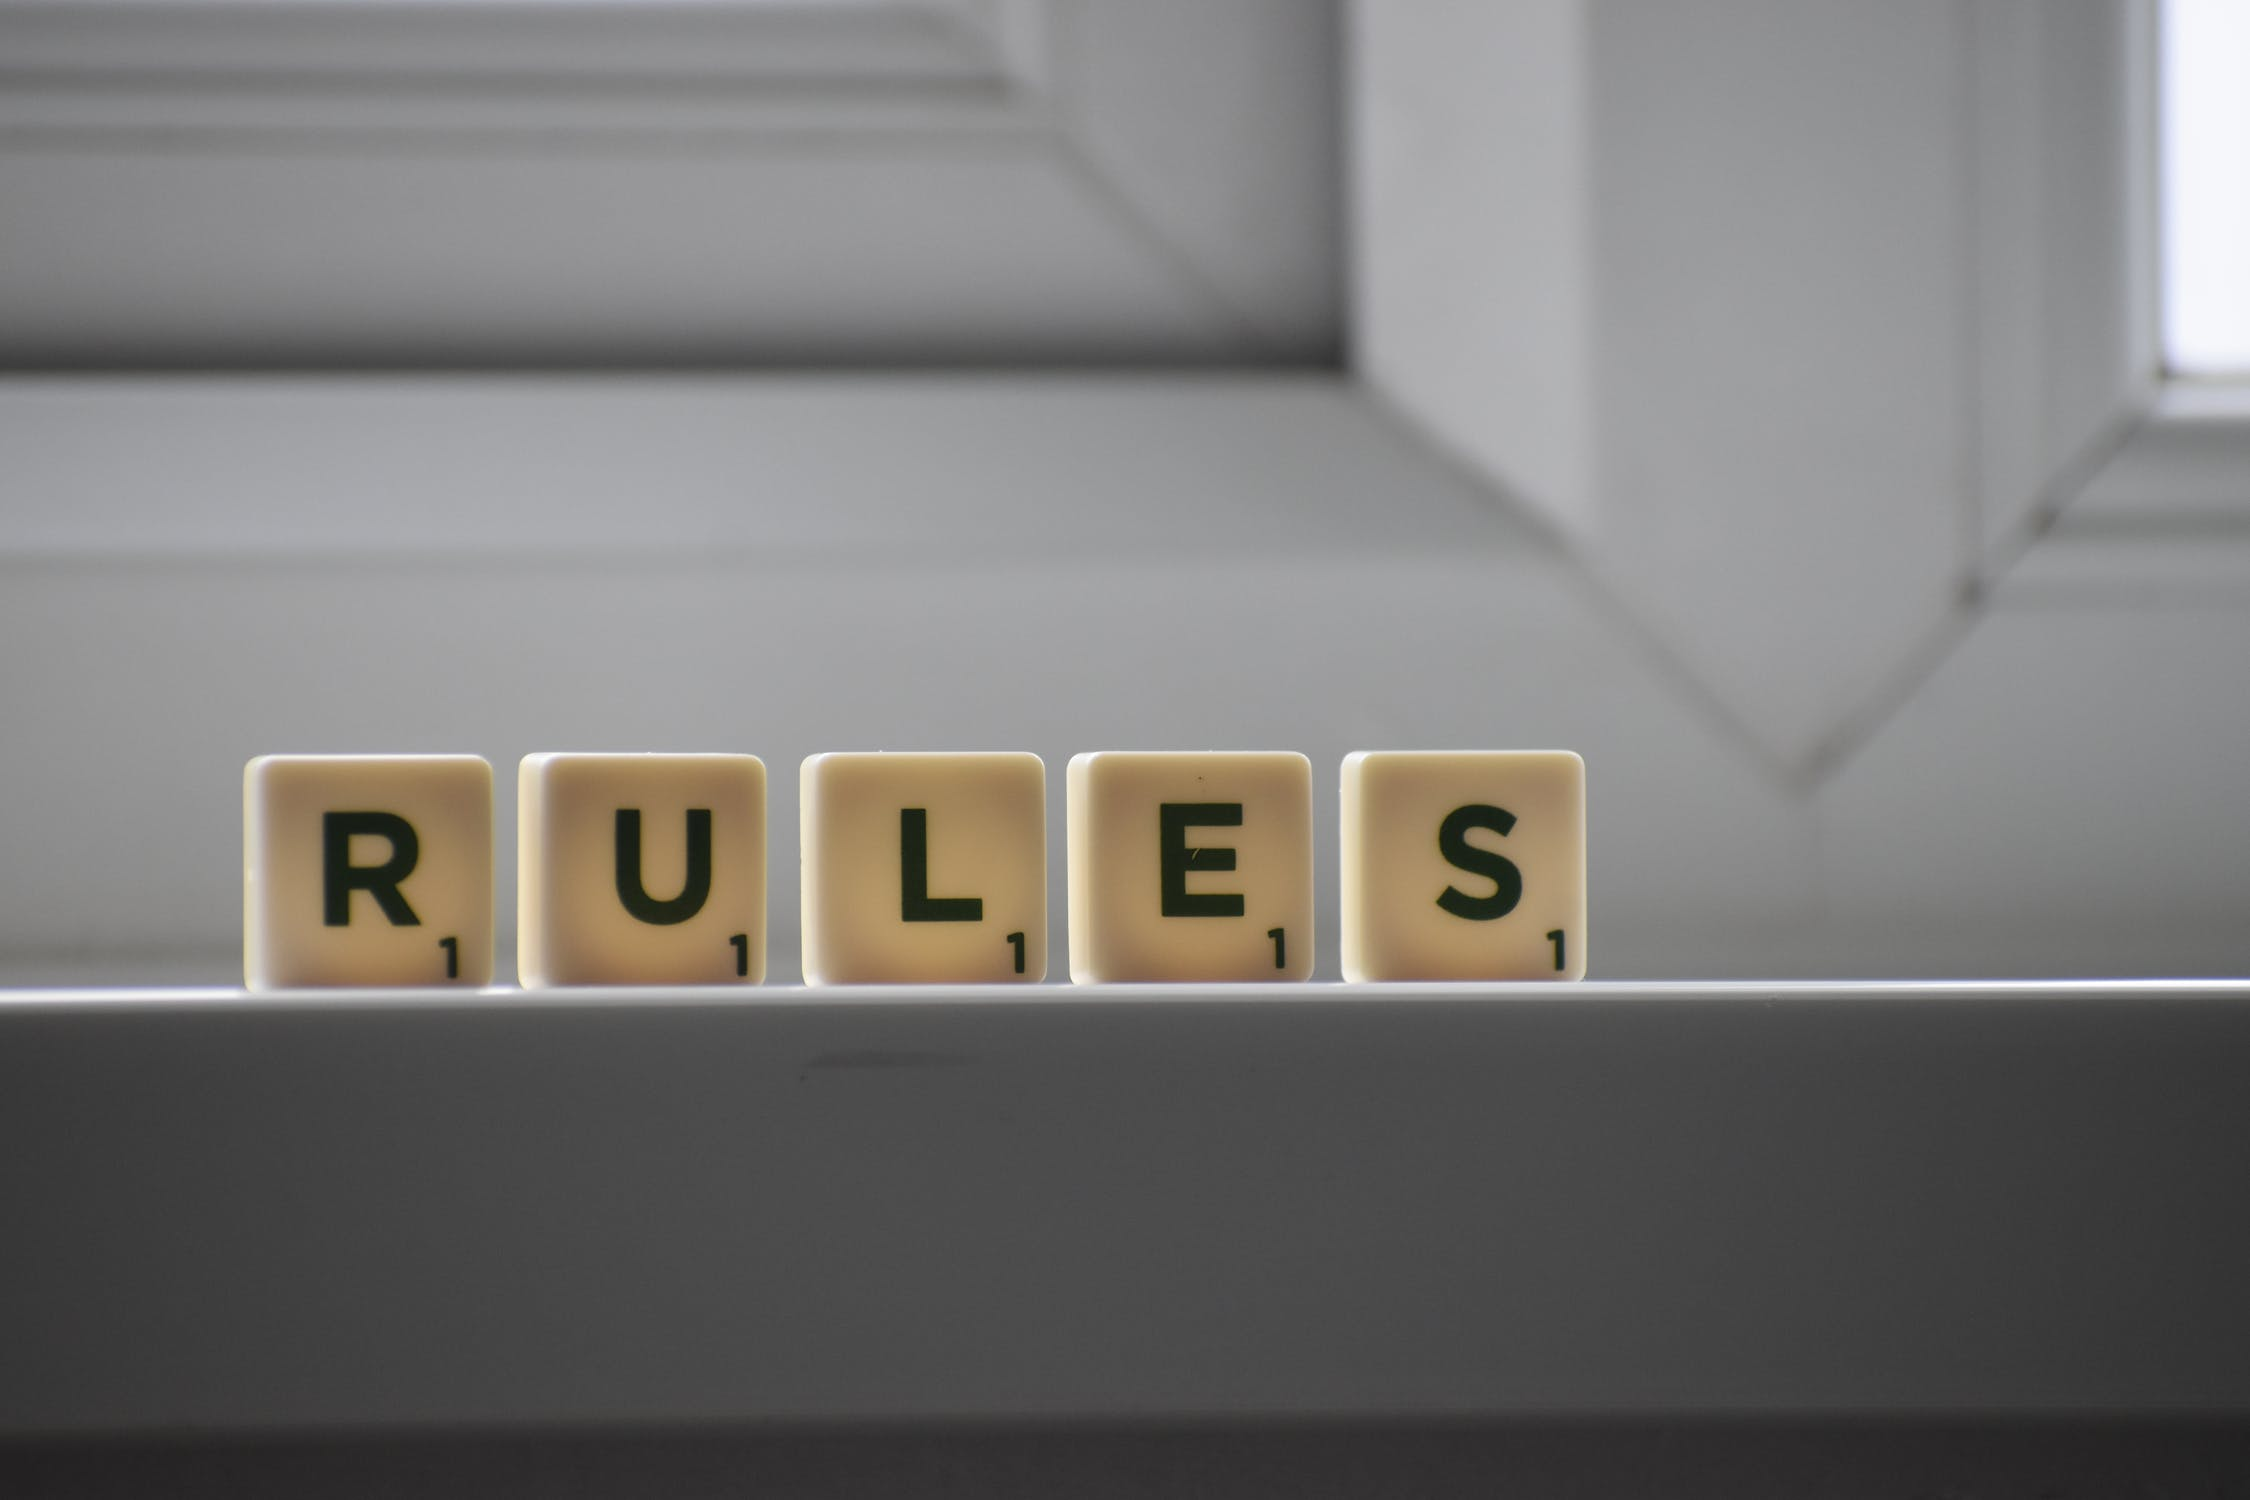 Unwritten Rules of the Corridor